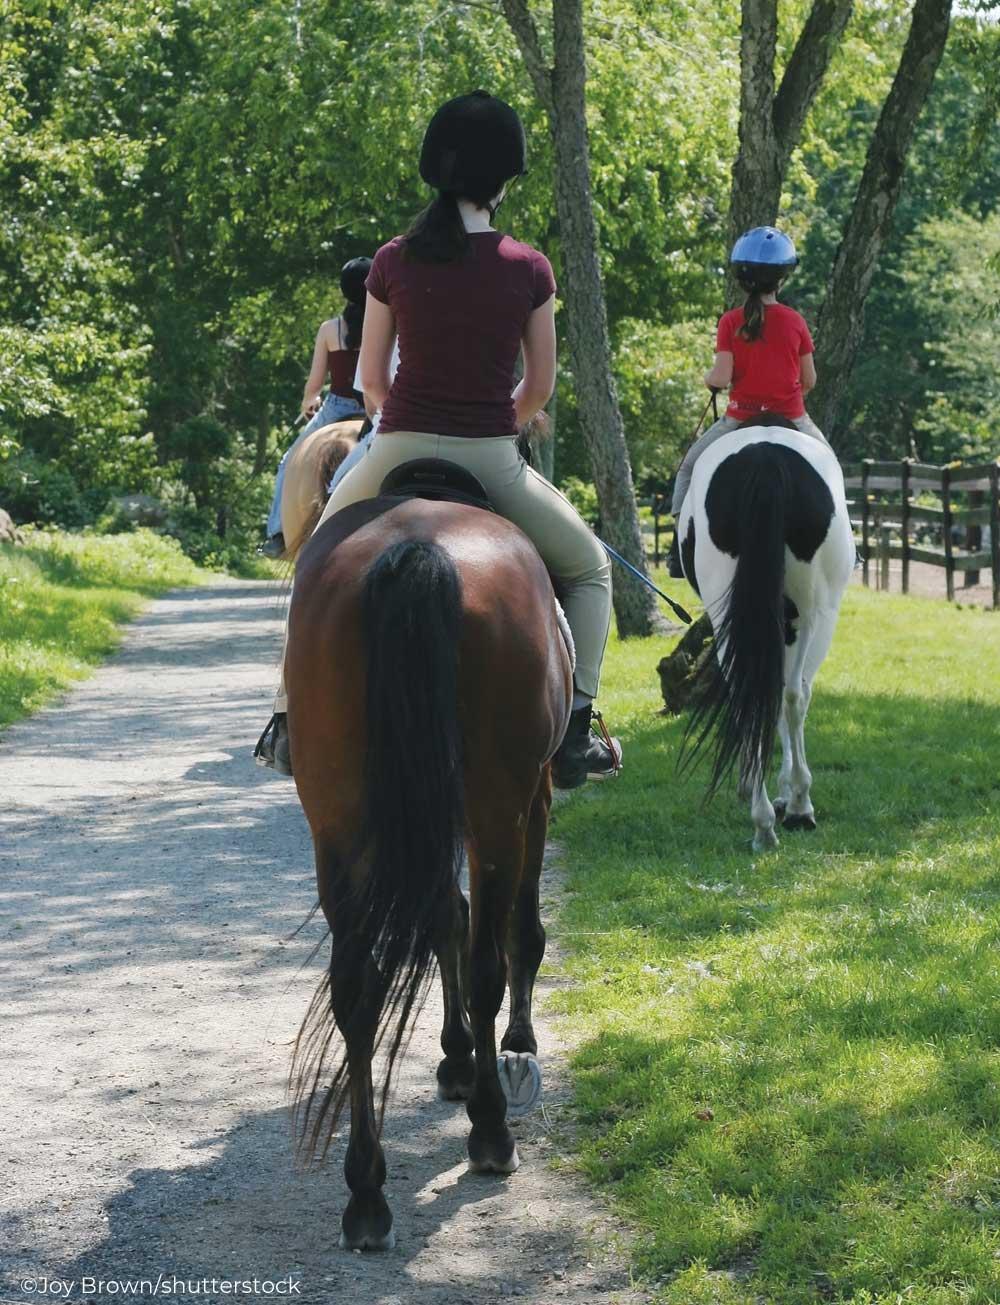 Three English riders riding down a path